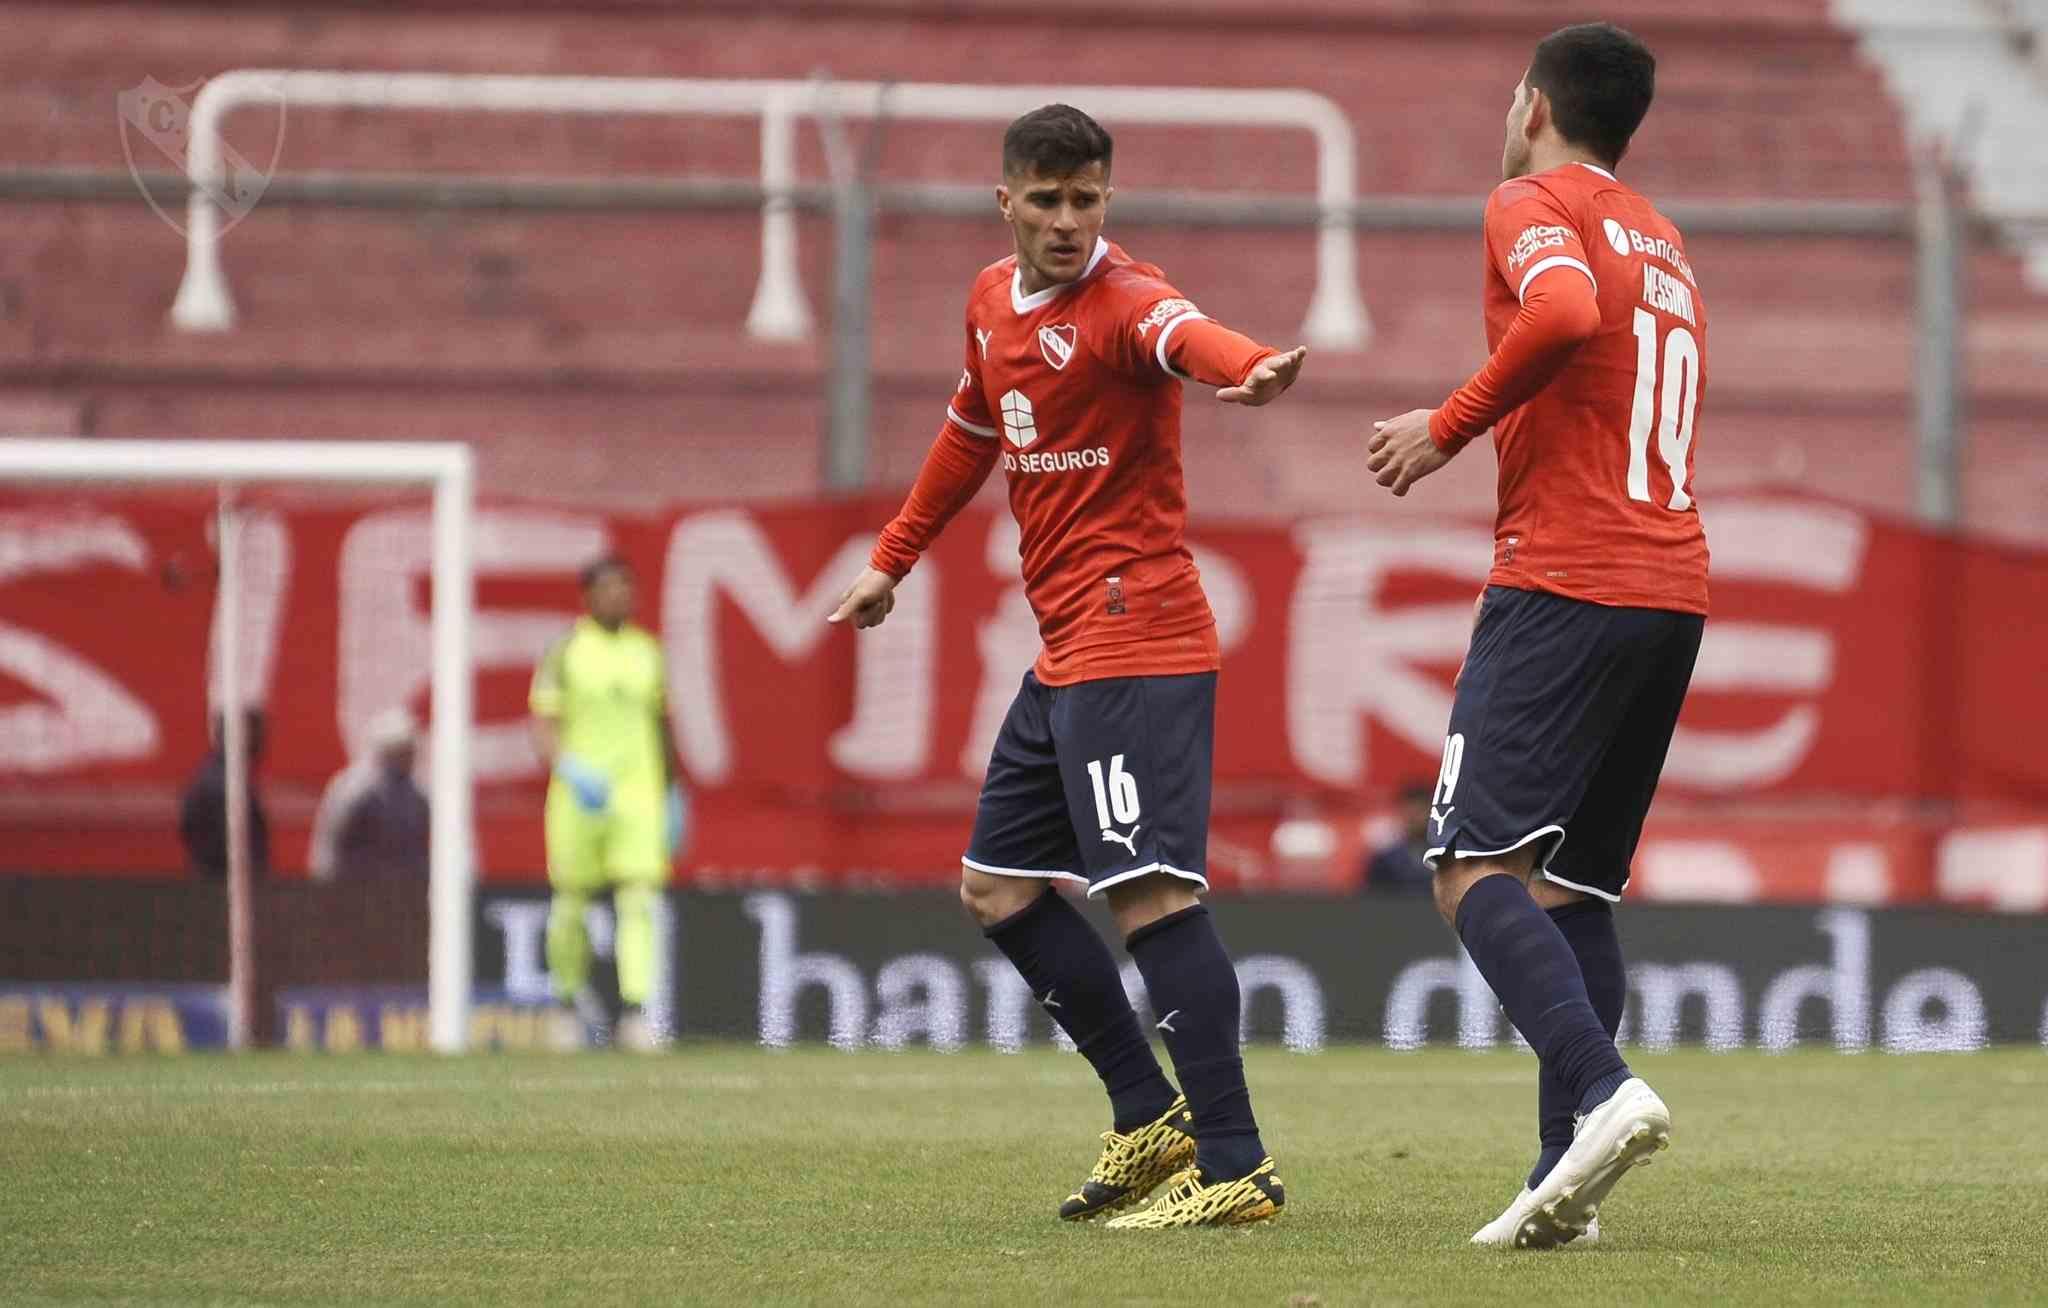 Messiniti marcó por 3 ante Vélez